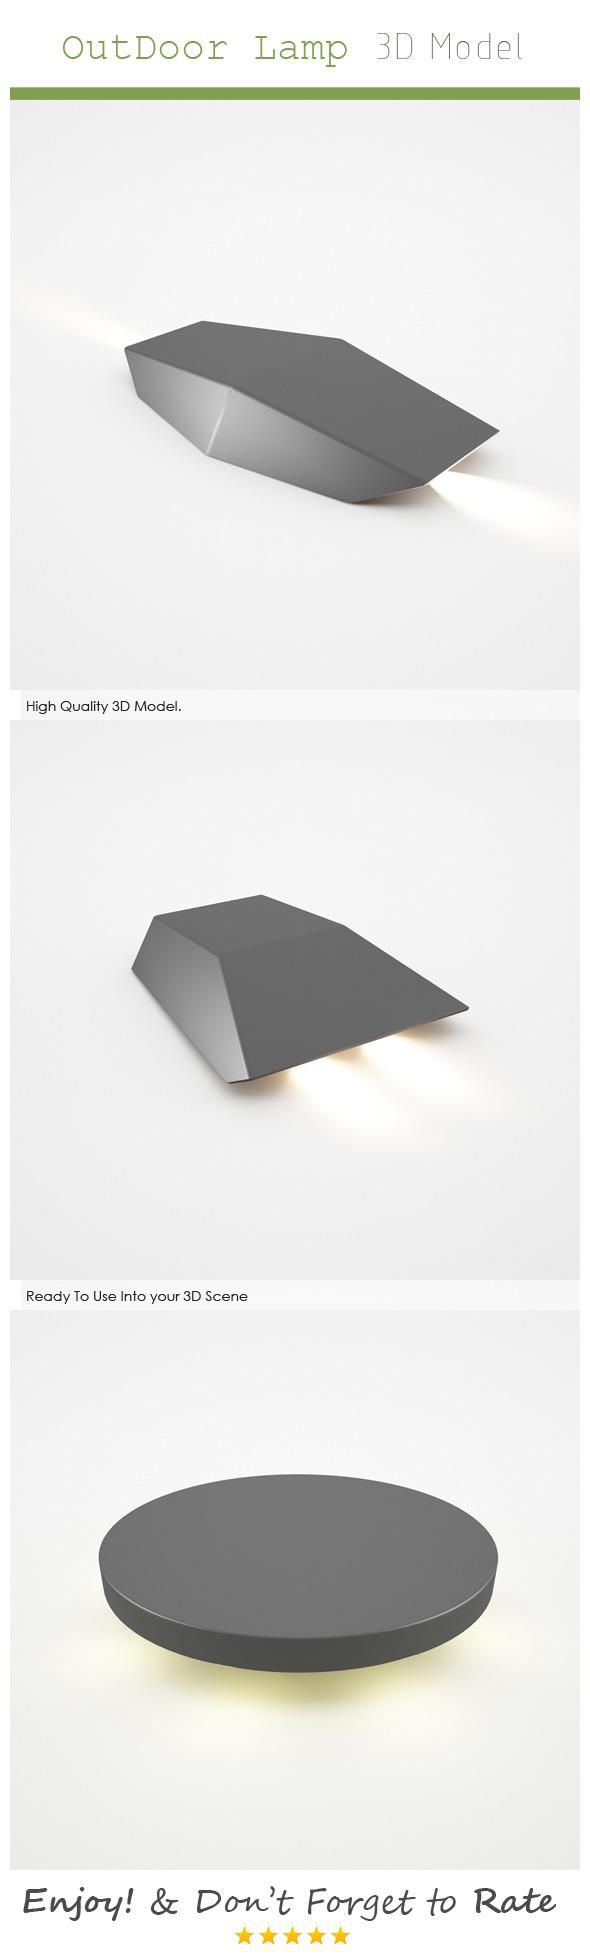 Outdoor Lamp 3D Model - 3DOcean Item for Sale